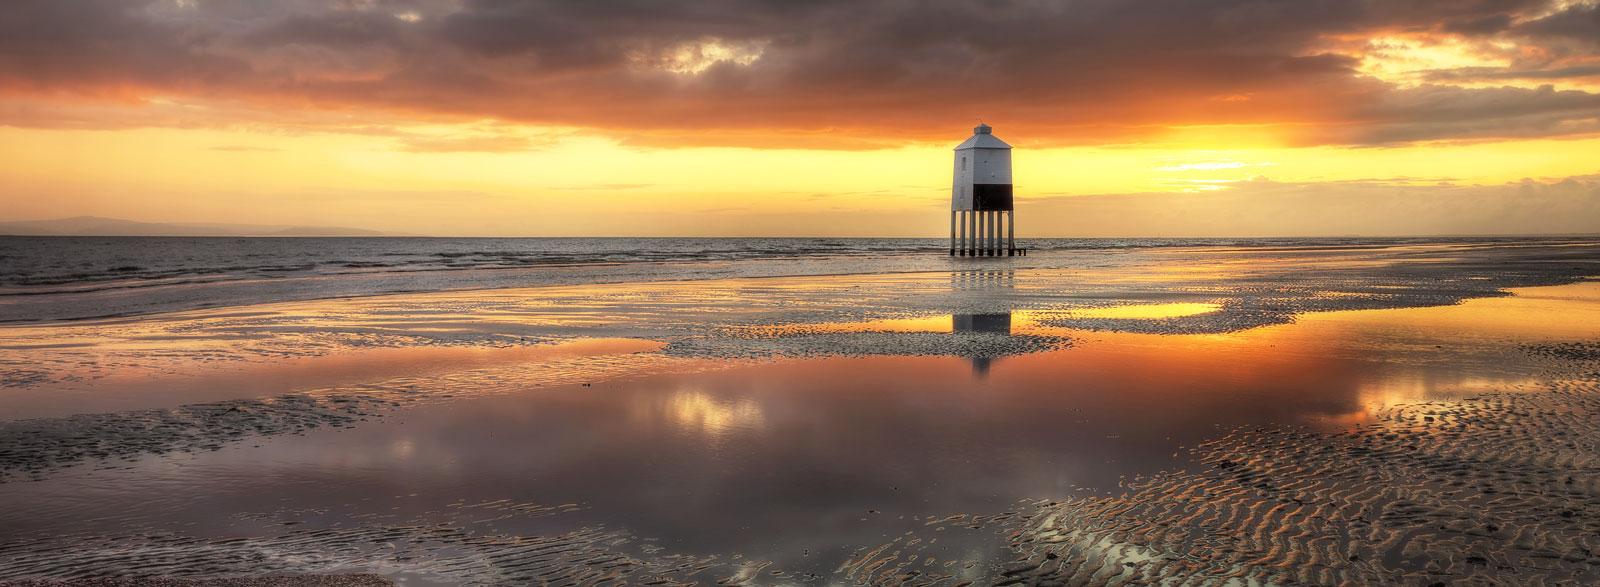 Lighthouse Amber Panorama